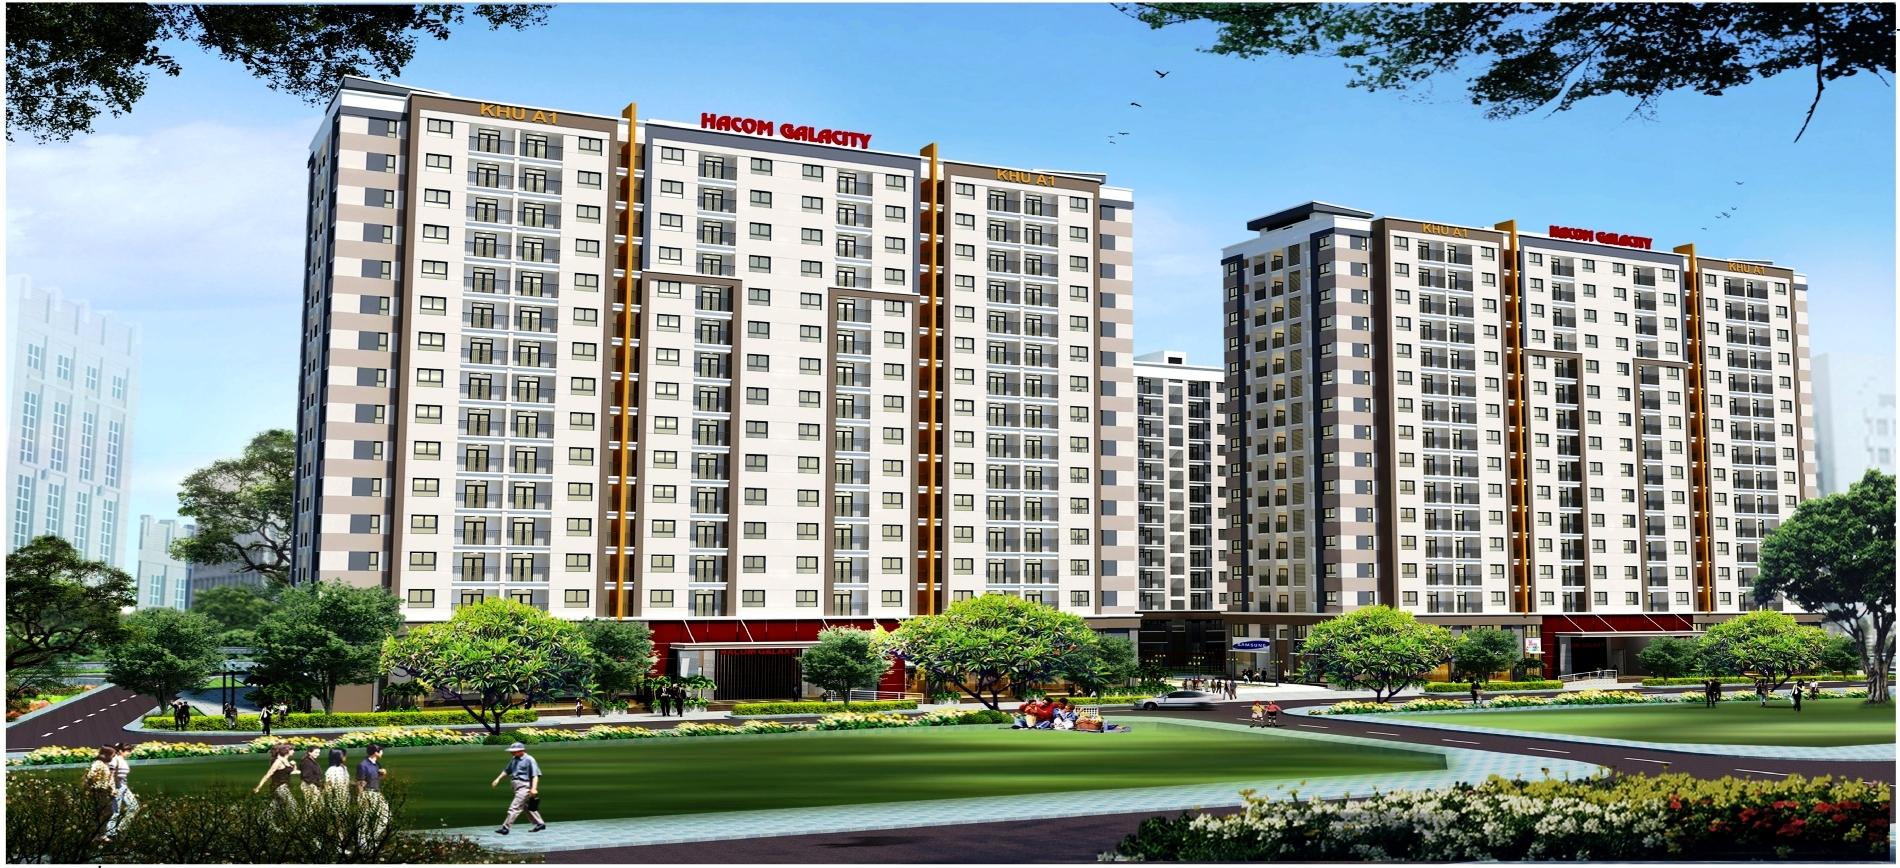 Dự án chung cư Hacom Galacity Ninh Thuận